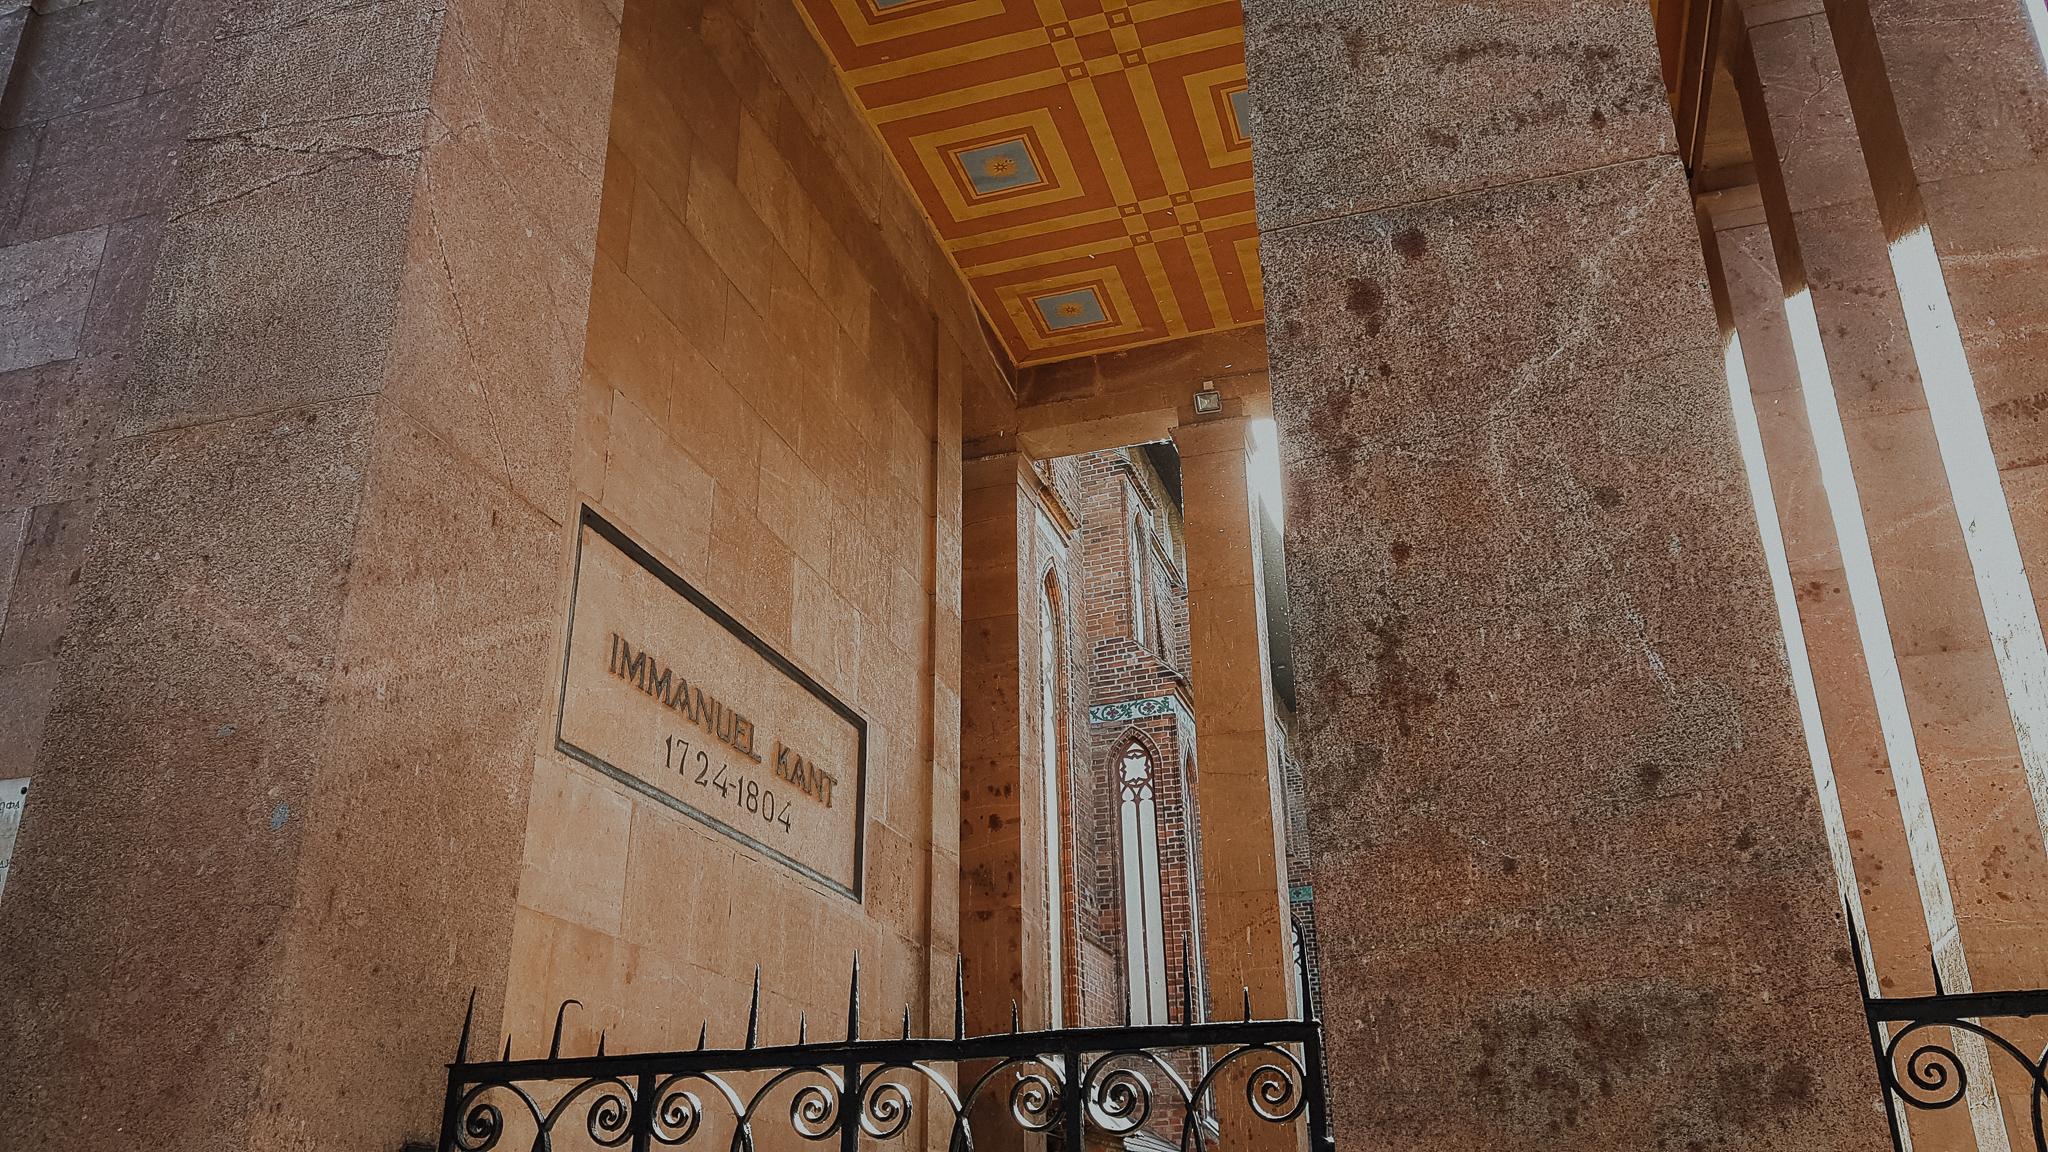 grób emanuela kanta